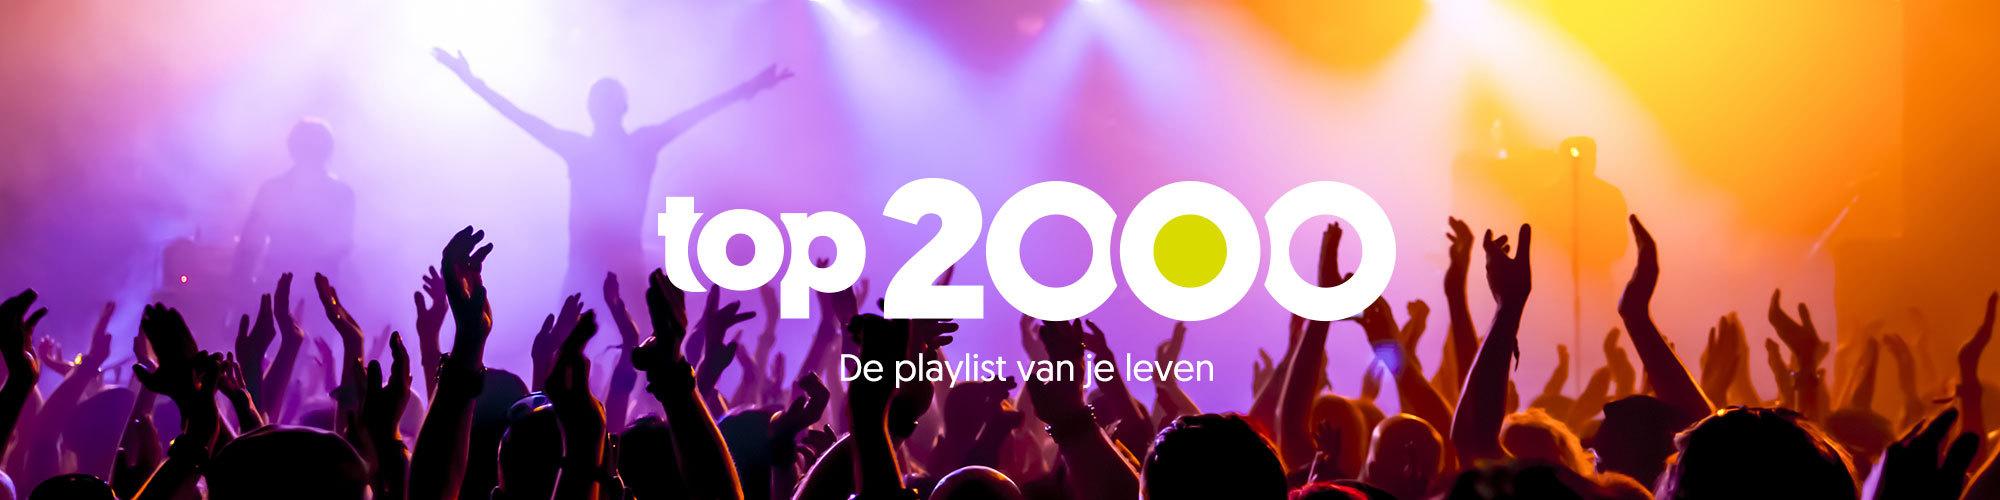 Joe carrousel top2000 finaal playlistvanjeleven 5